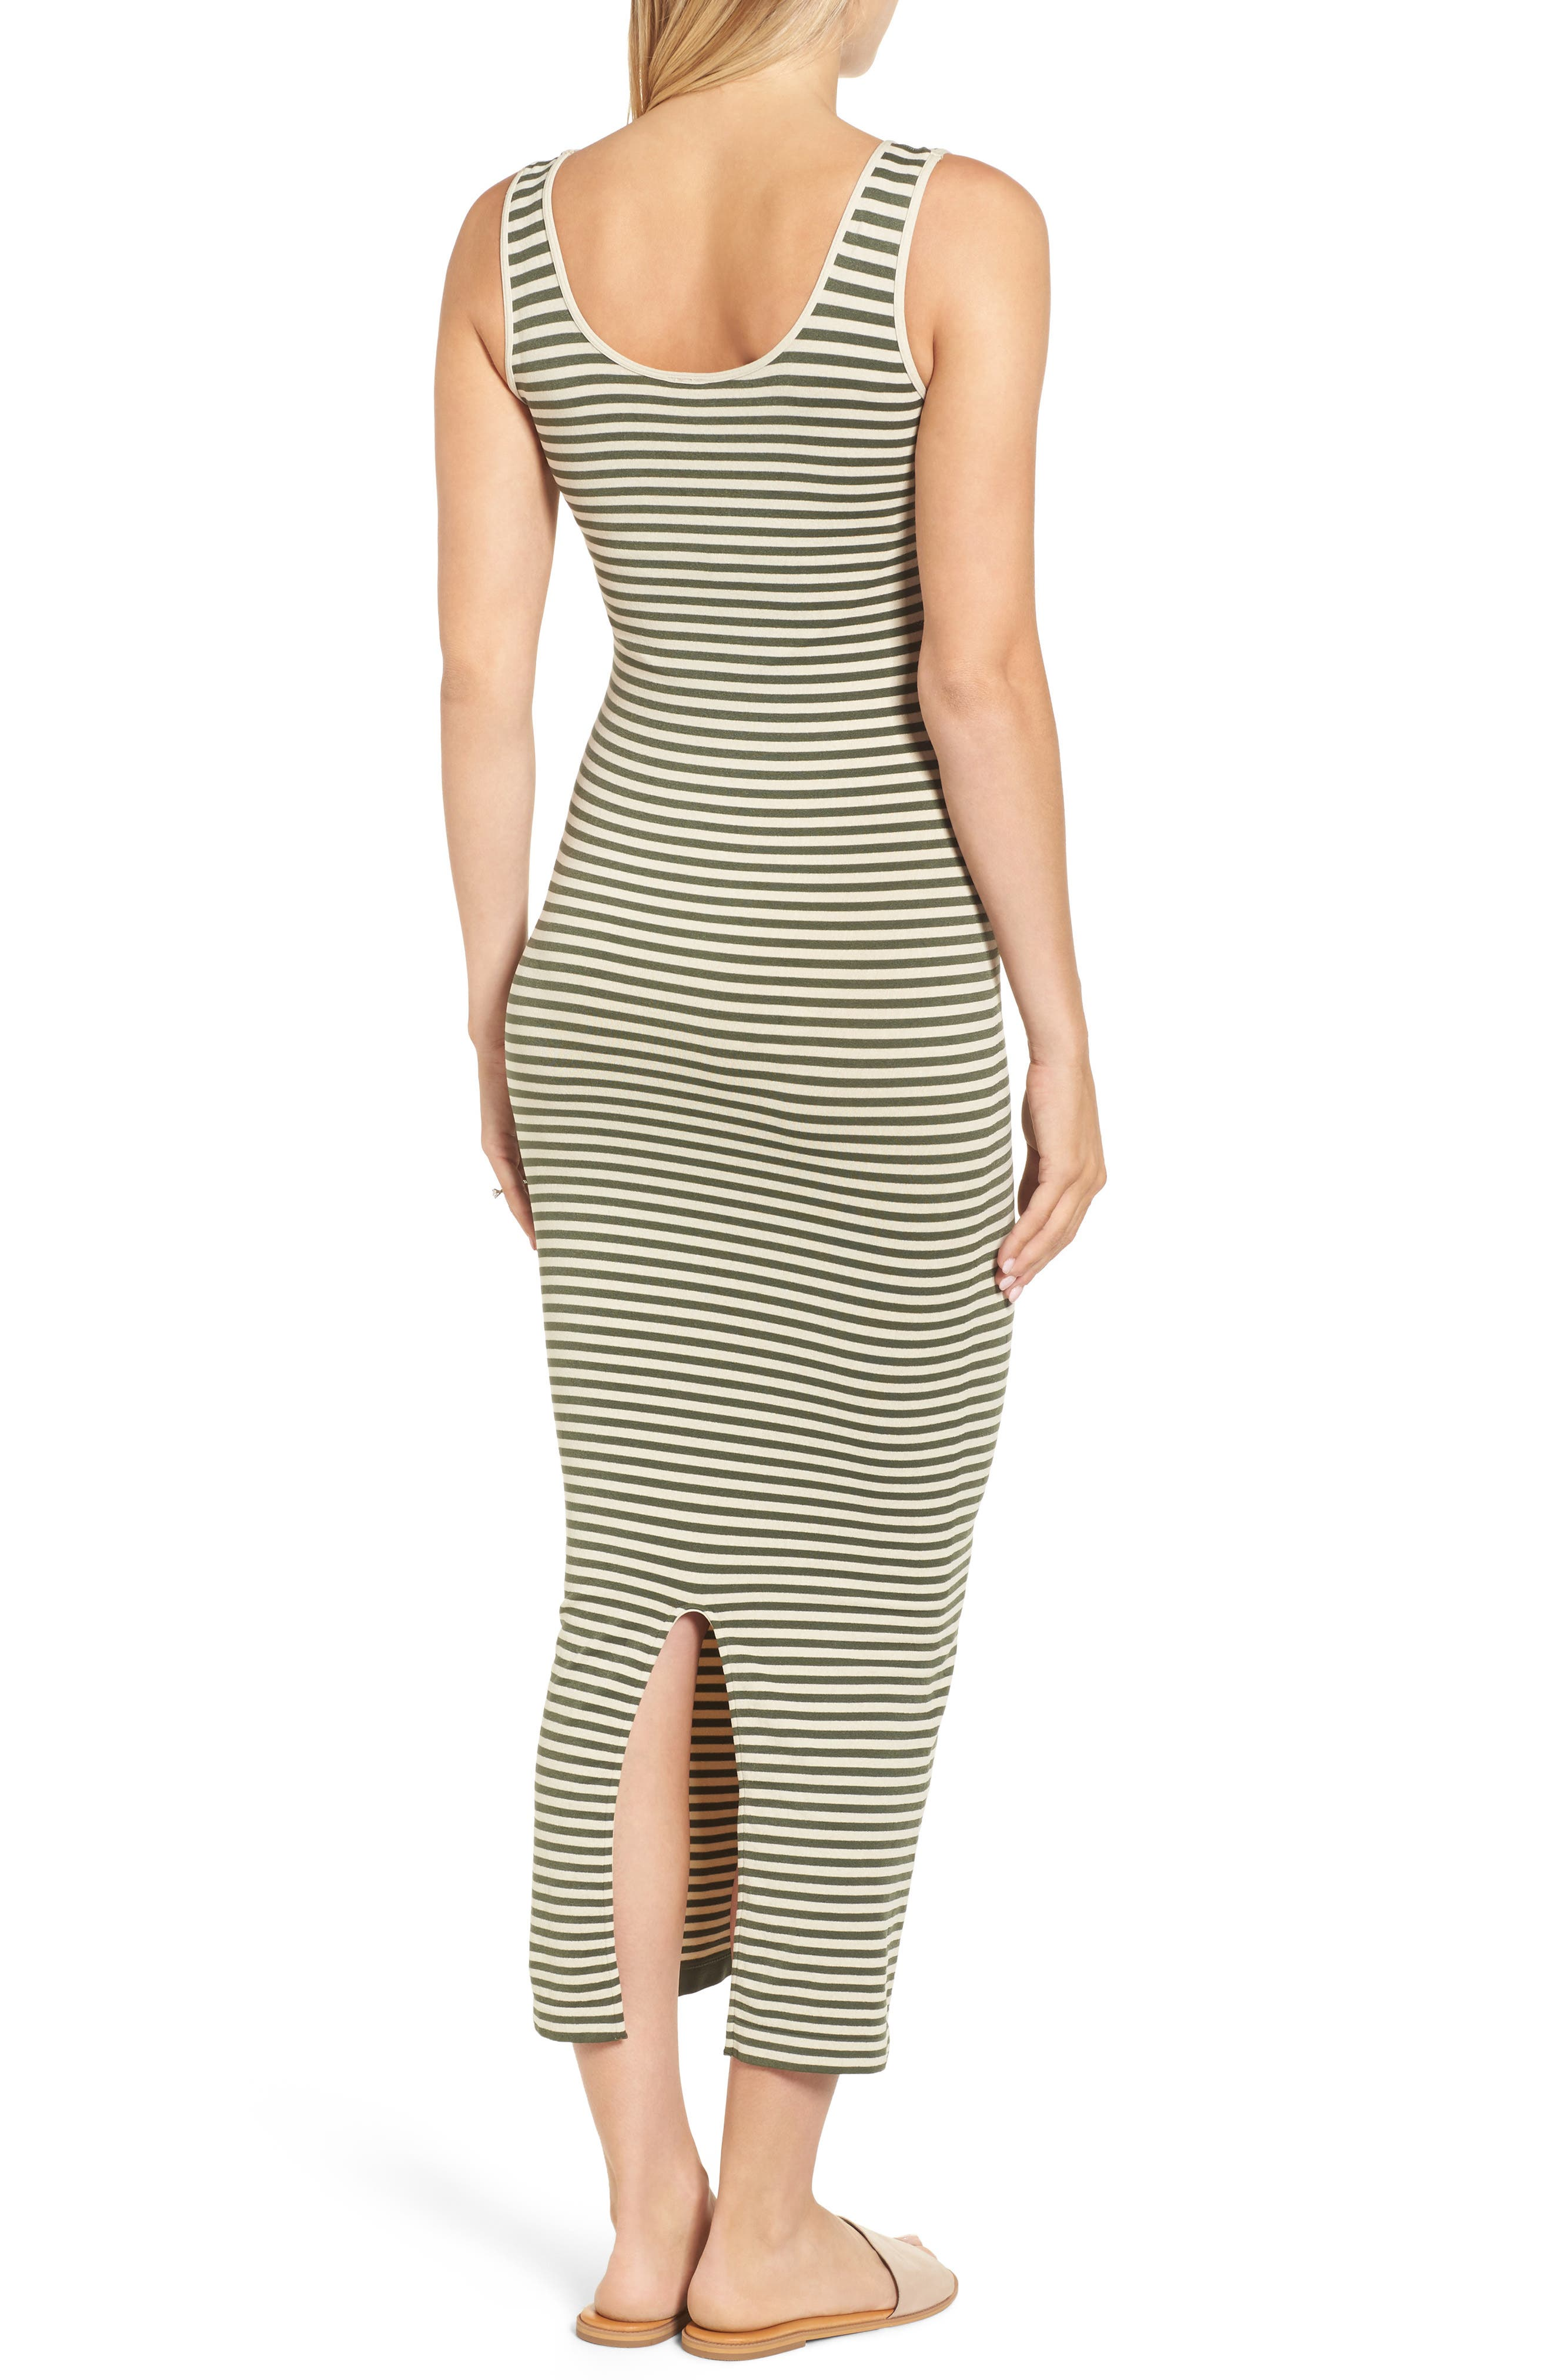 Micro Stripe Maternity Dress,                             Alternate thumbnail 2, color,                             300